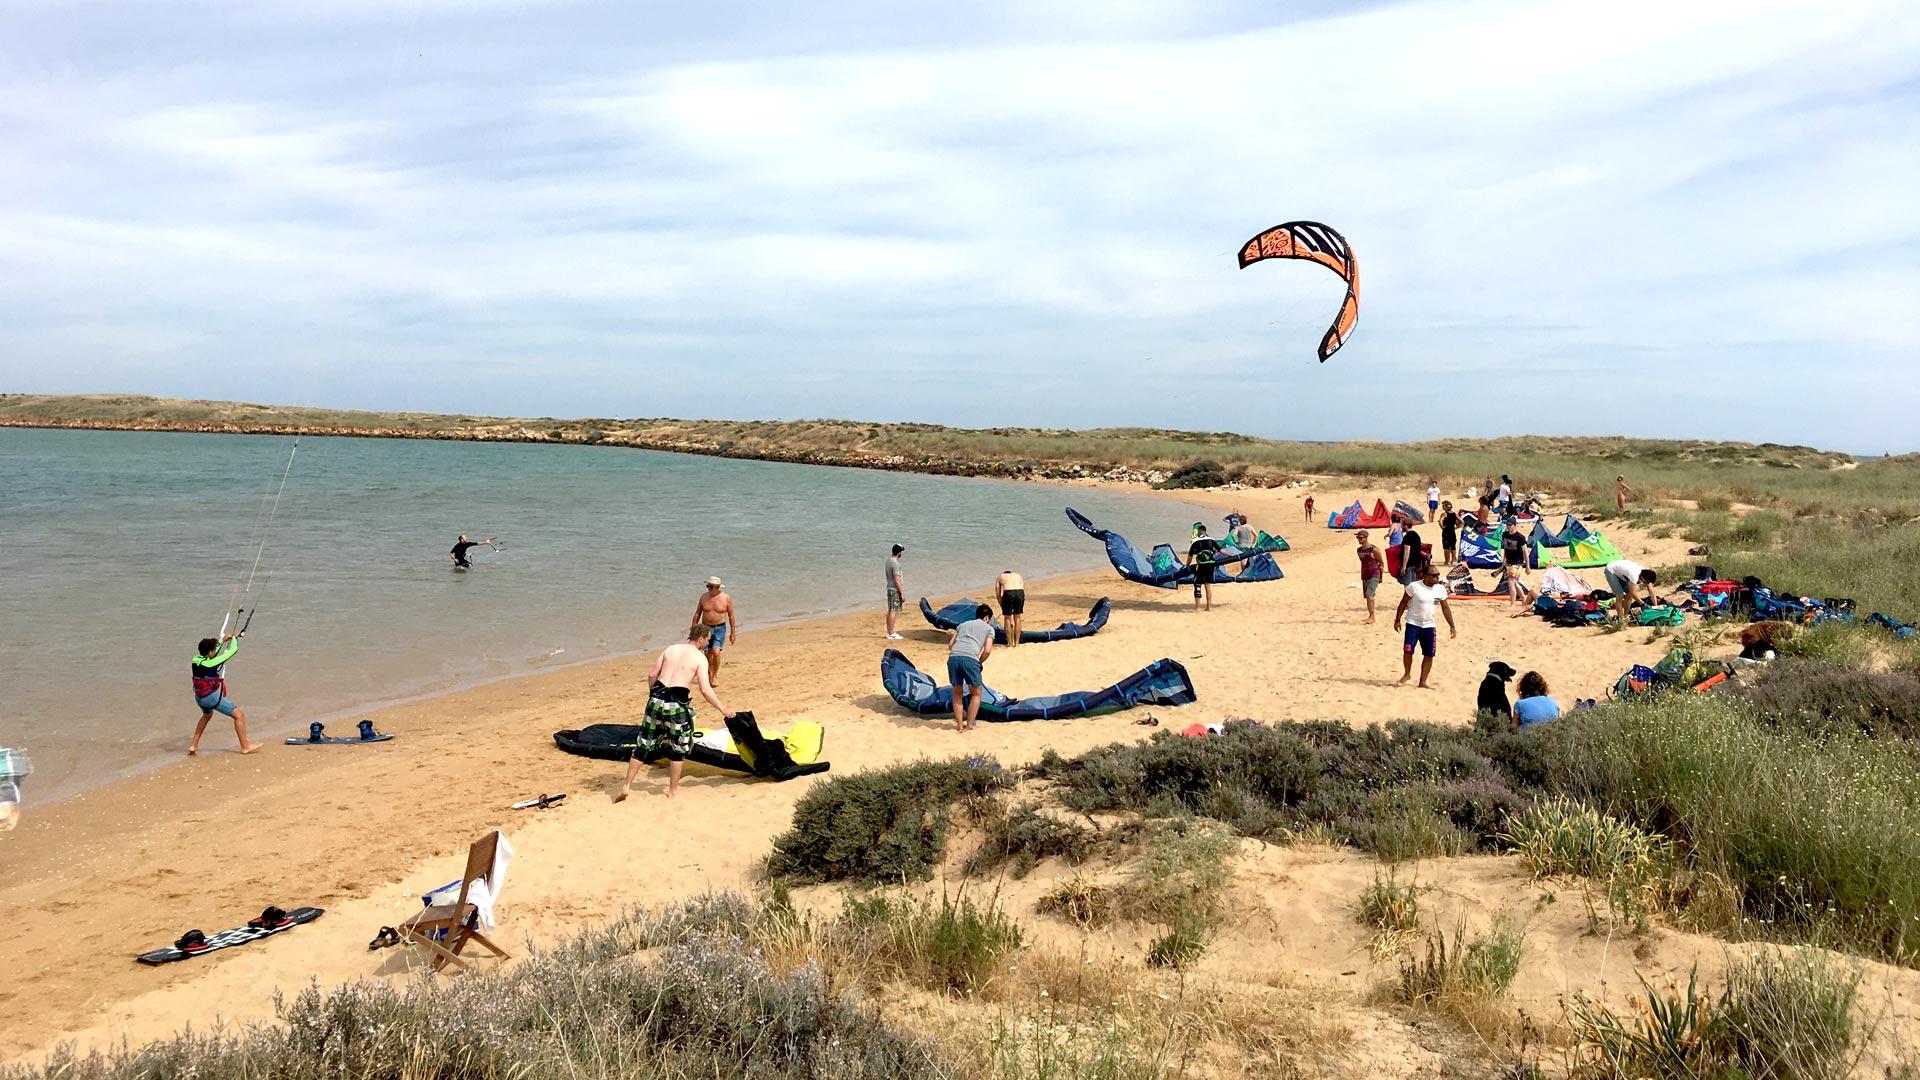 Algarve, Lagos, LAGOA DE ALVOR: Thermik Kiten – wenn Algarve dann Alvor